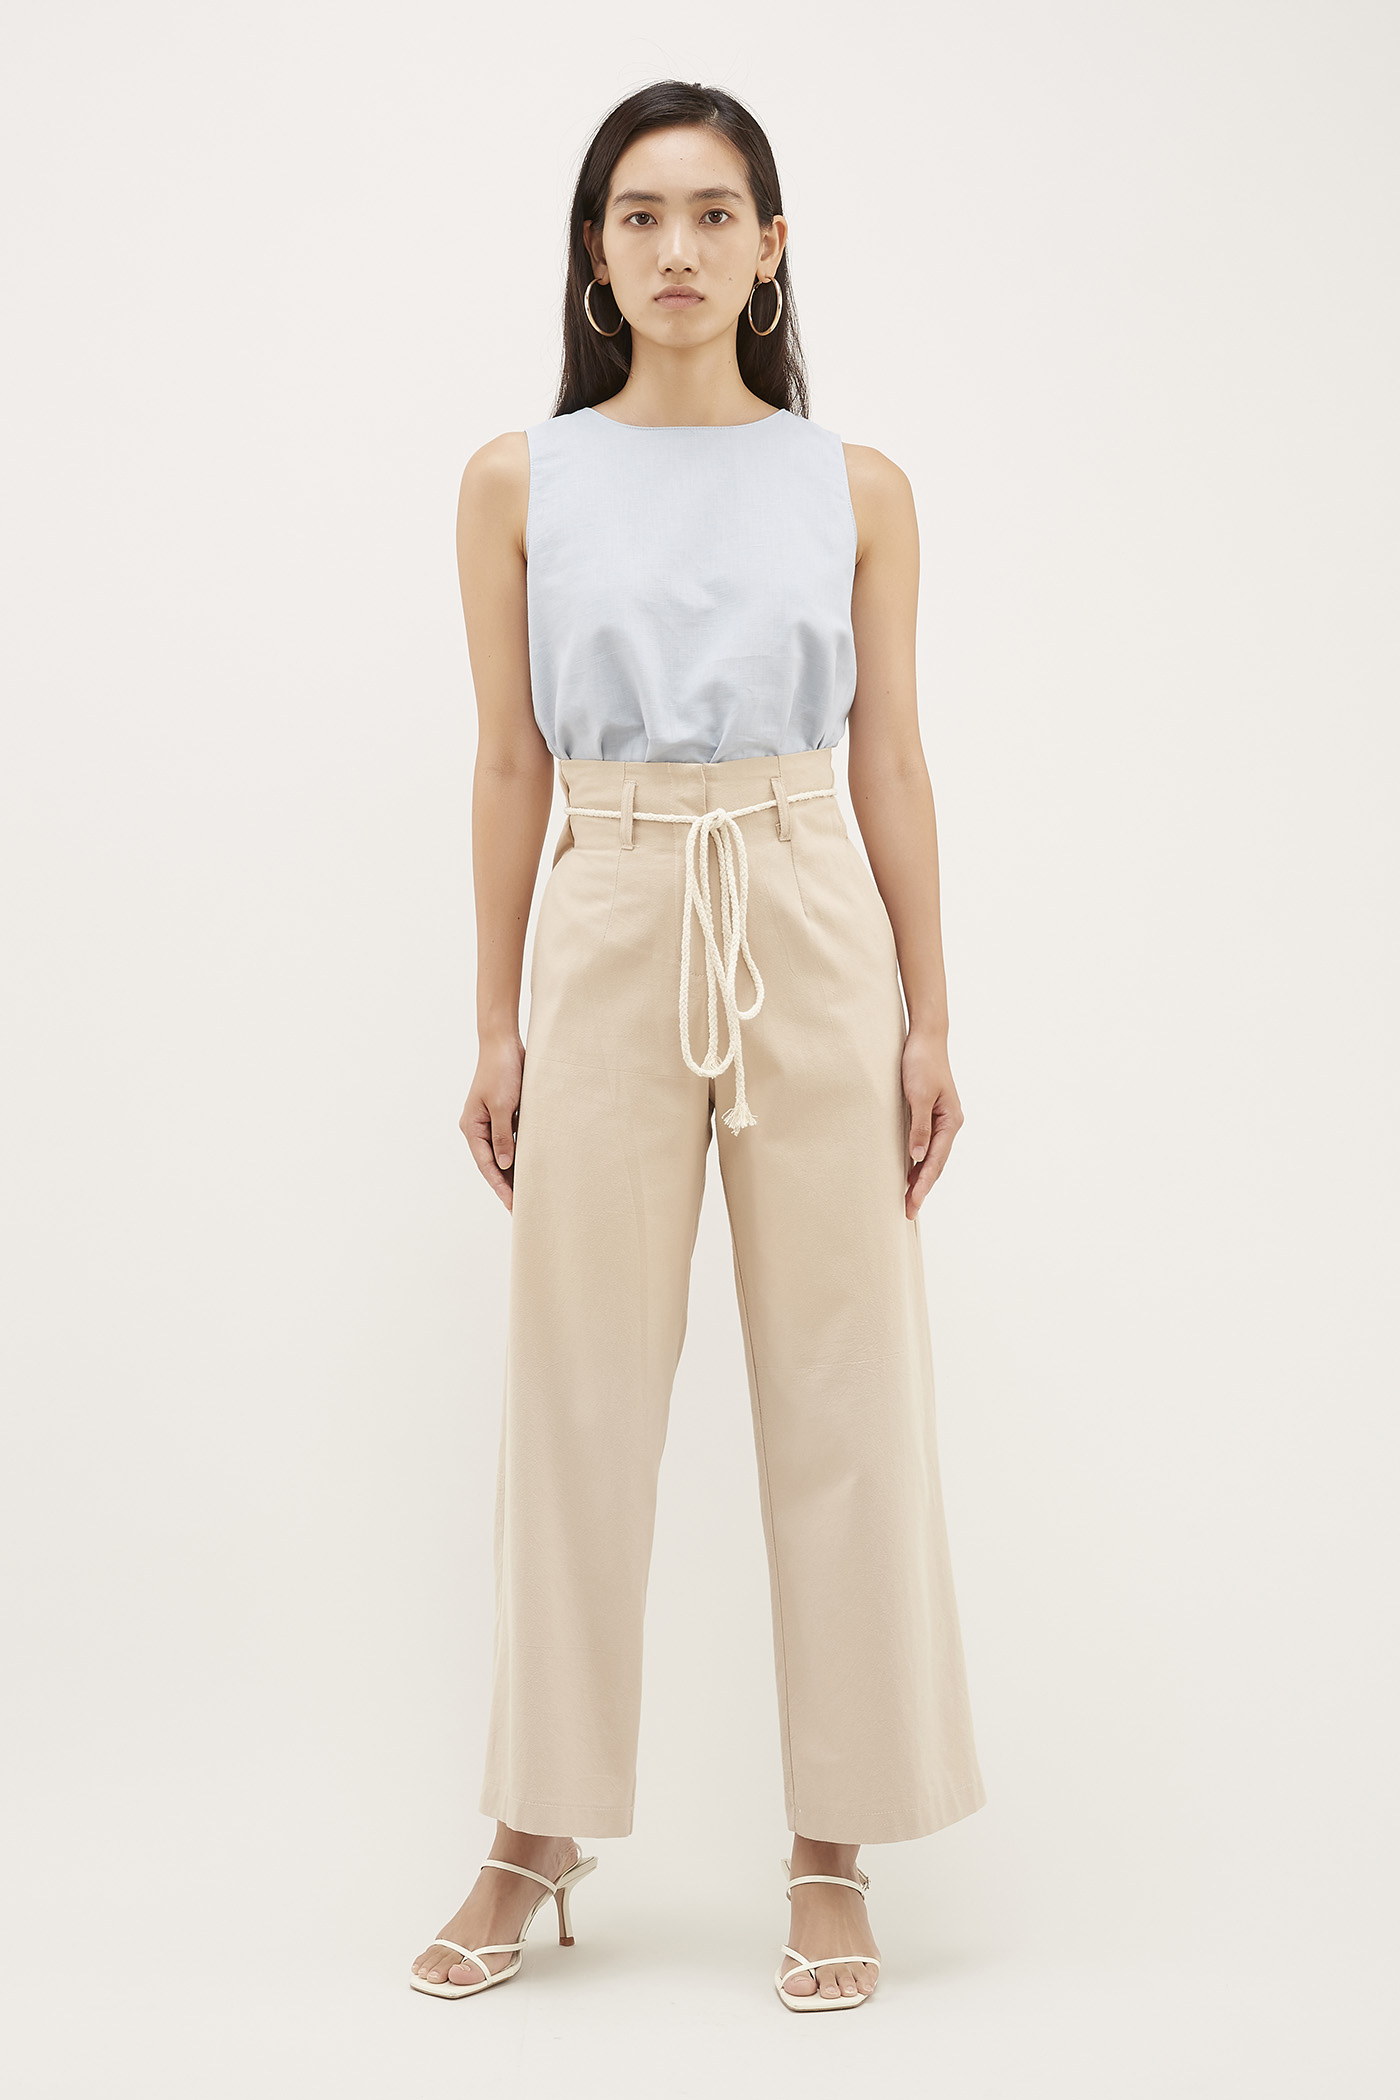 Kenyon Rope-tie Pants